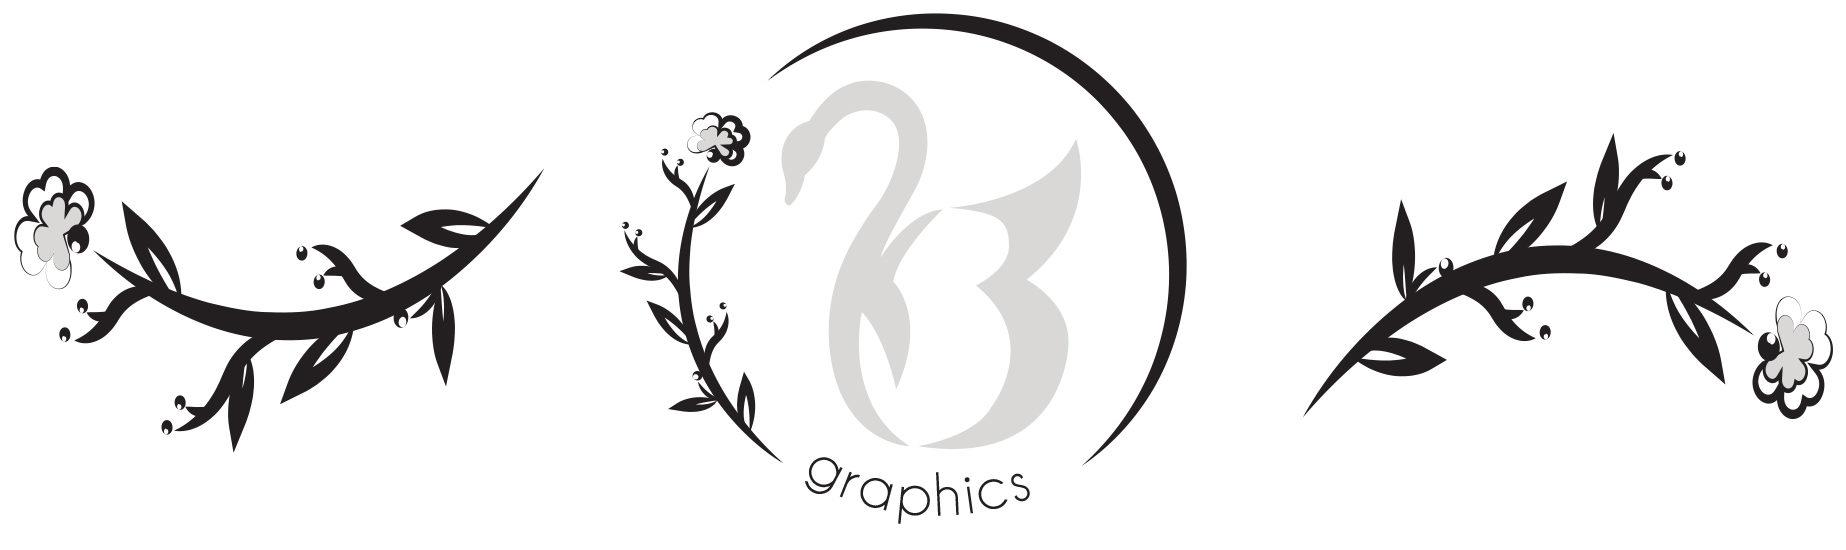 KB Graphics